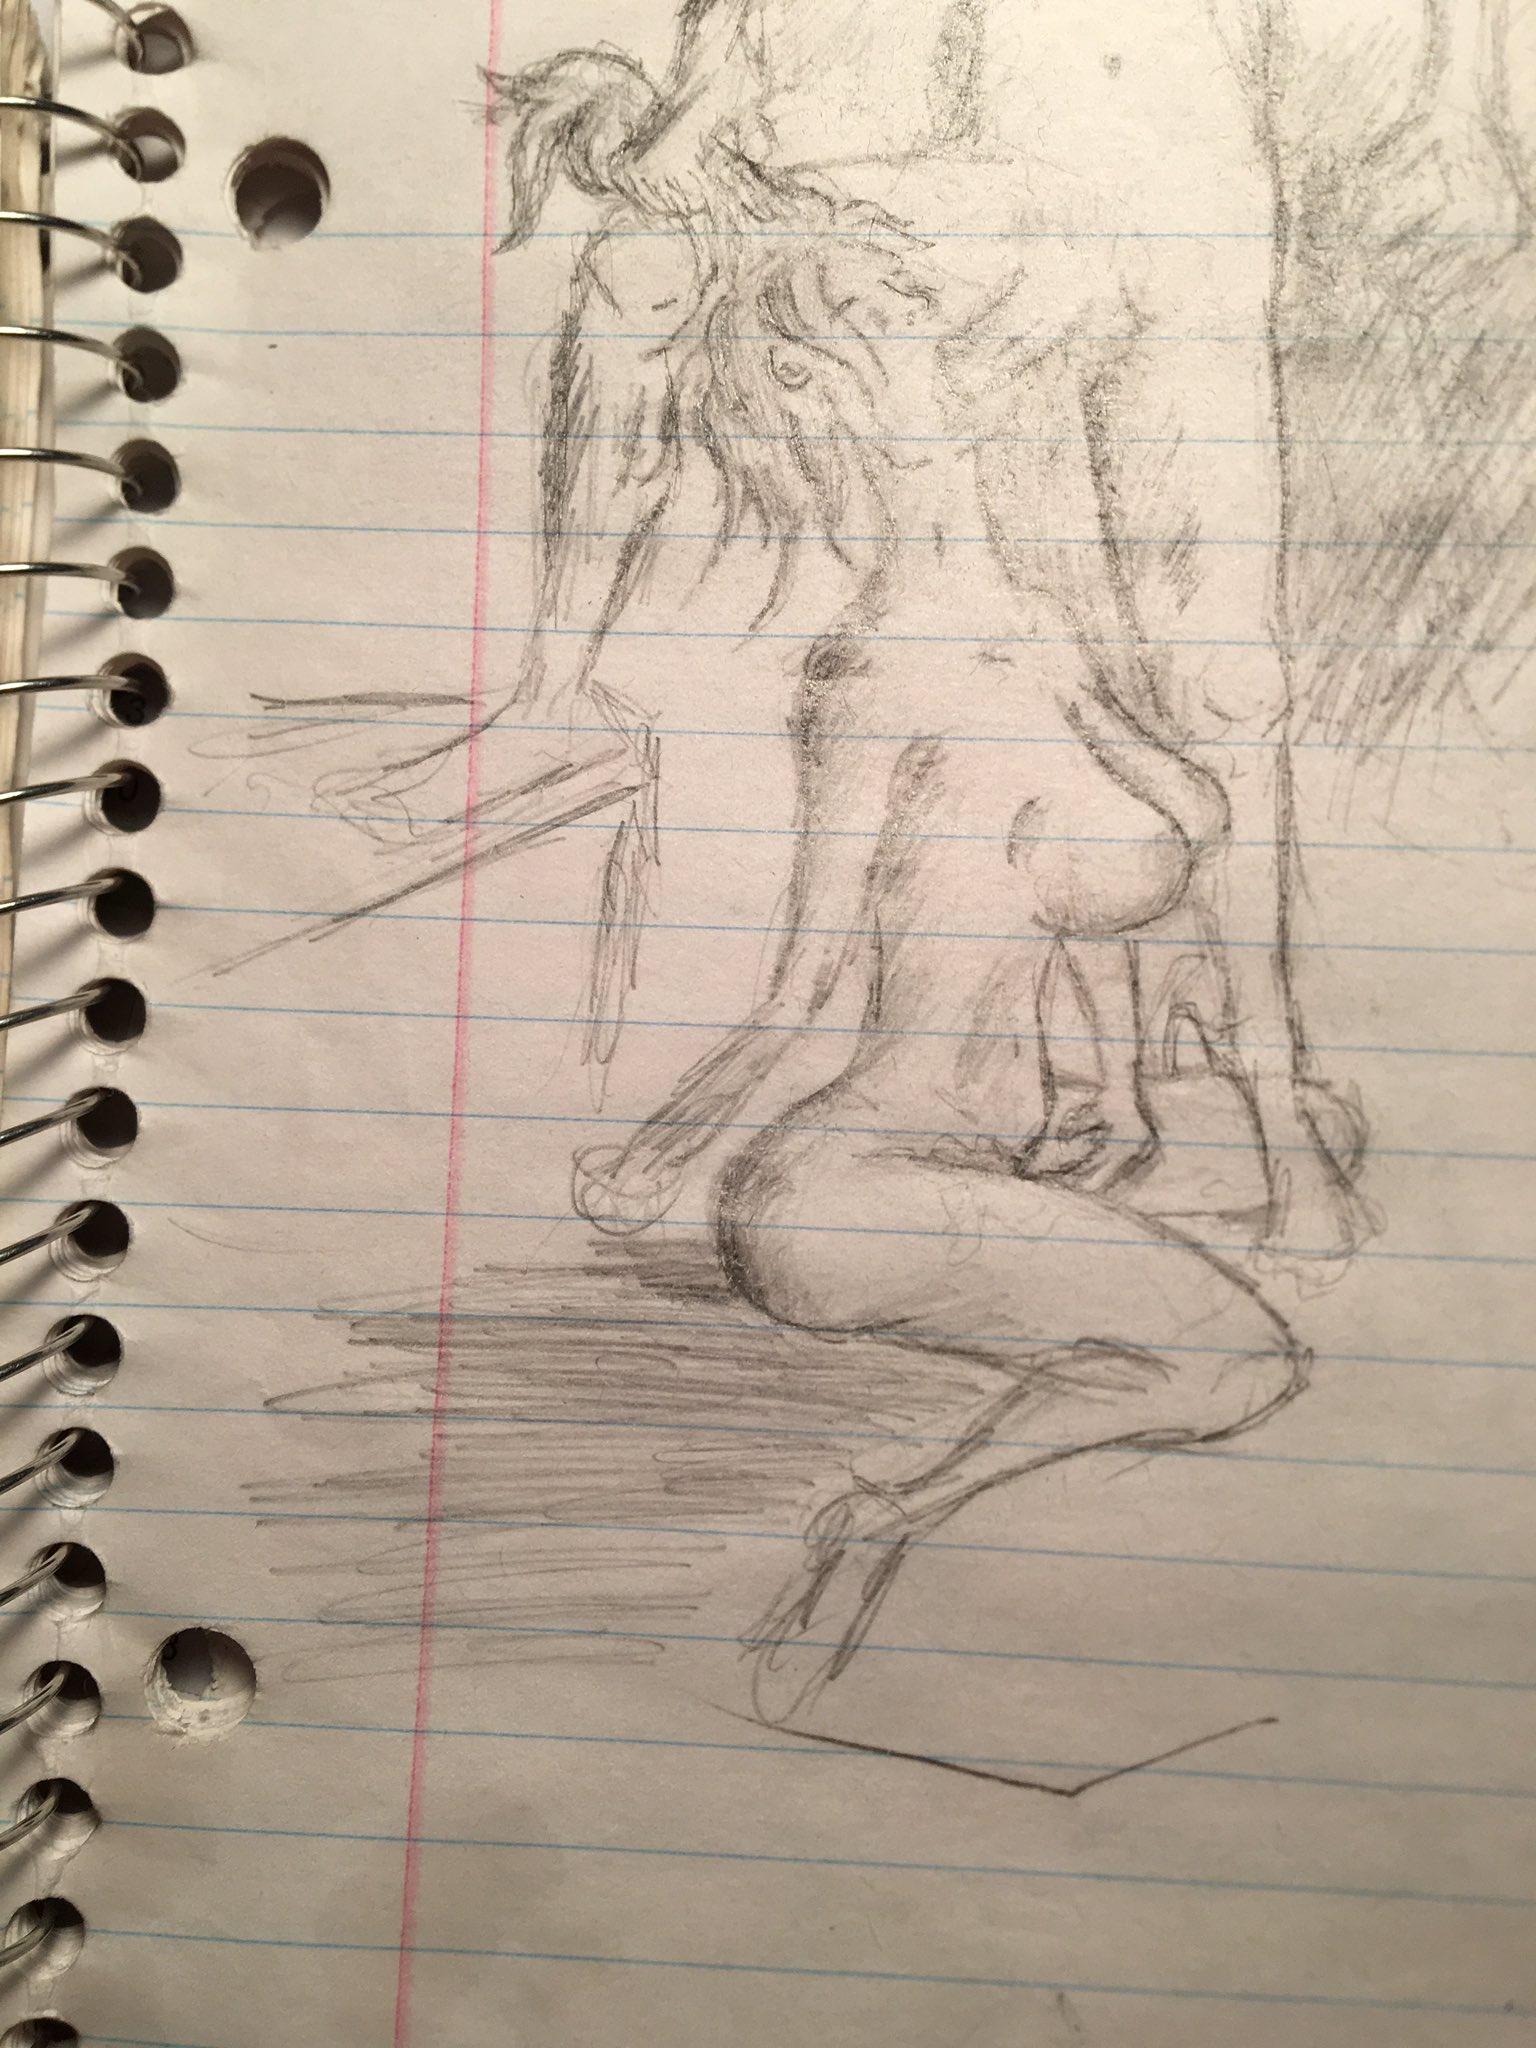 Hardcore love sketches